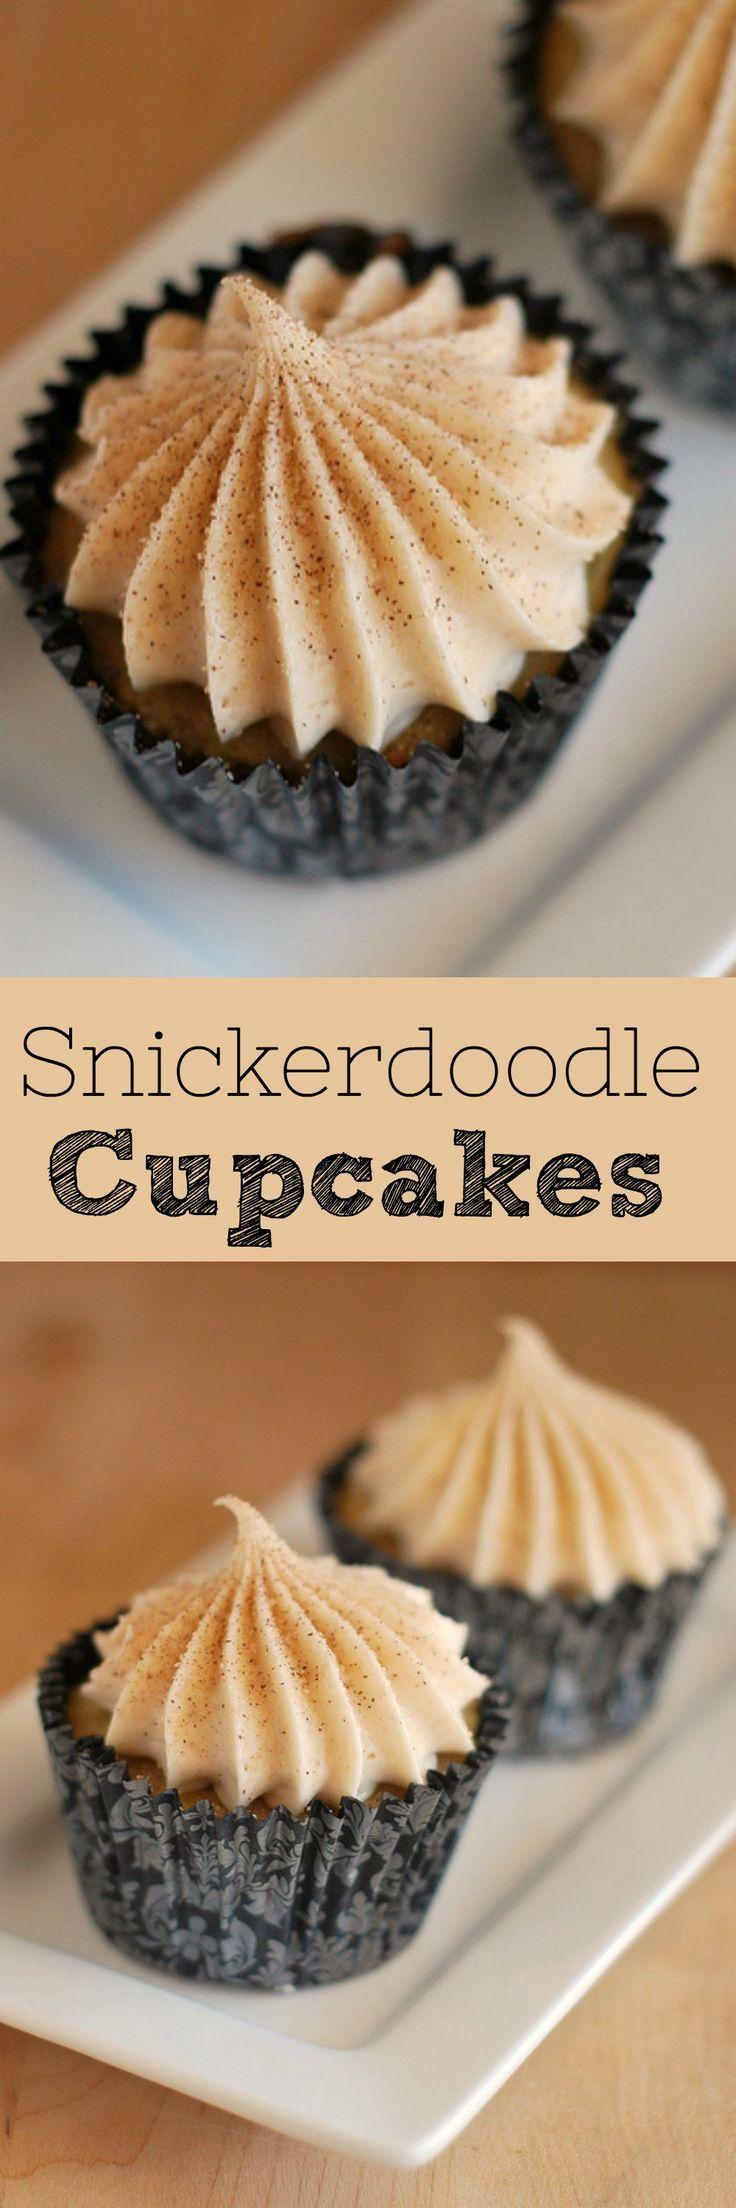 Snickerdoodle Cupcakes – Ihr Lieblings-Urlaubskeks als Cupcake! Zimtschale …